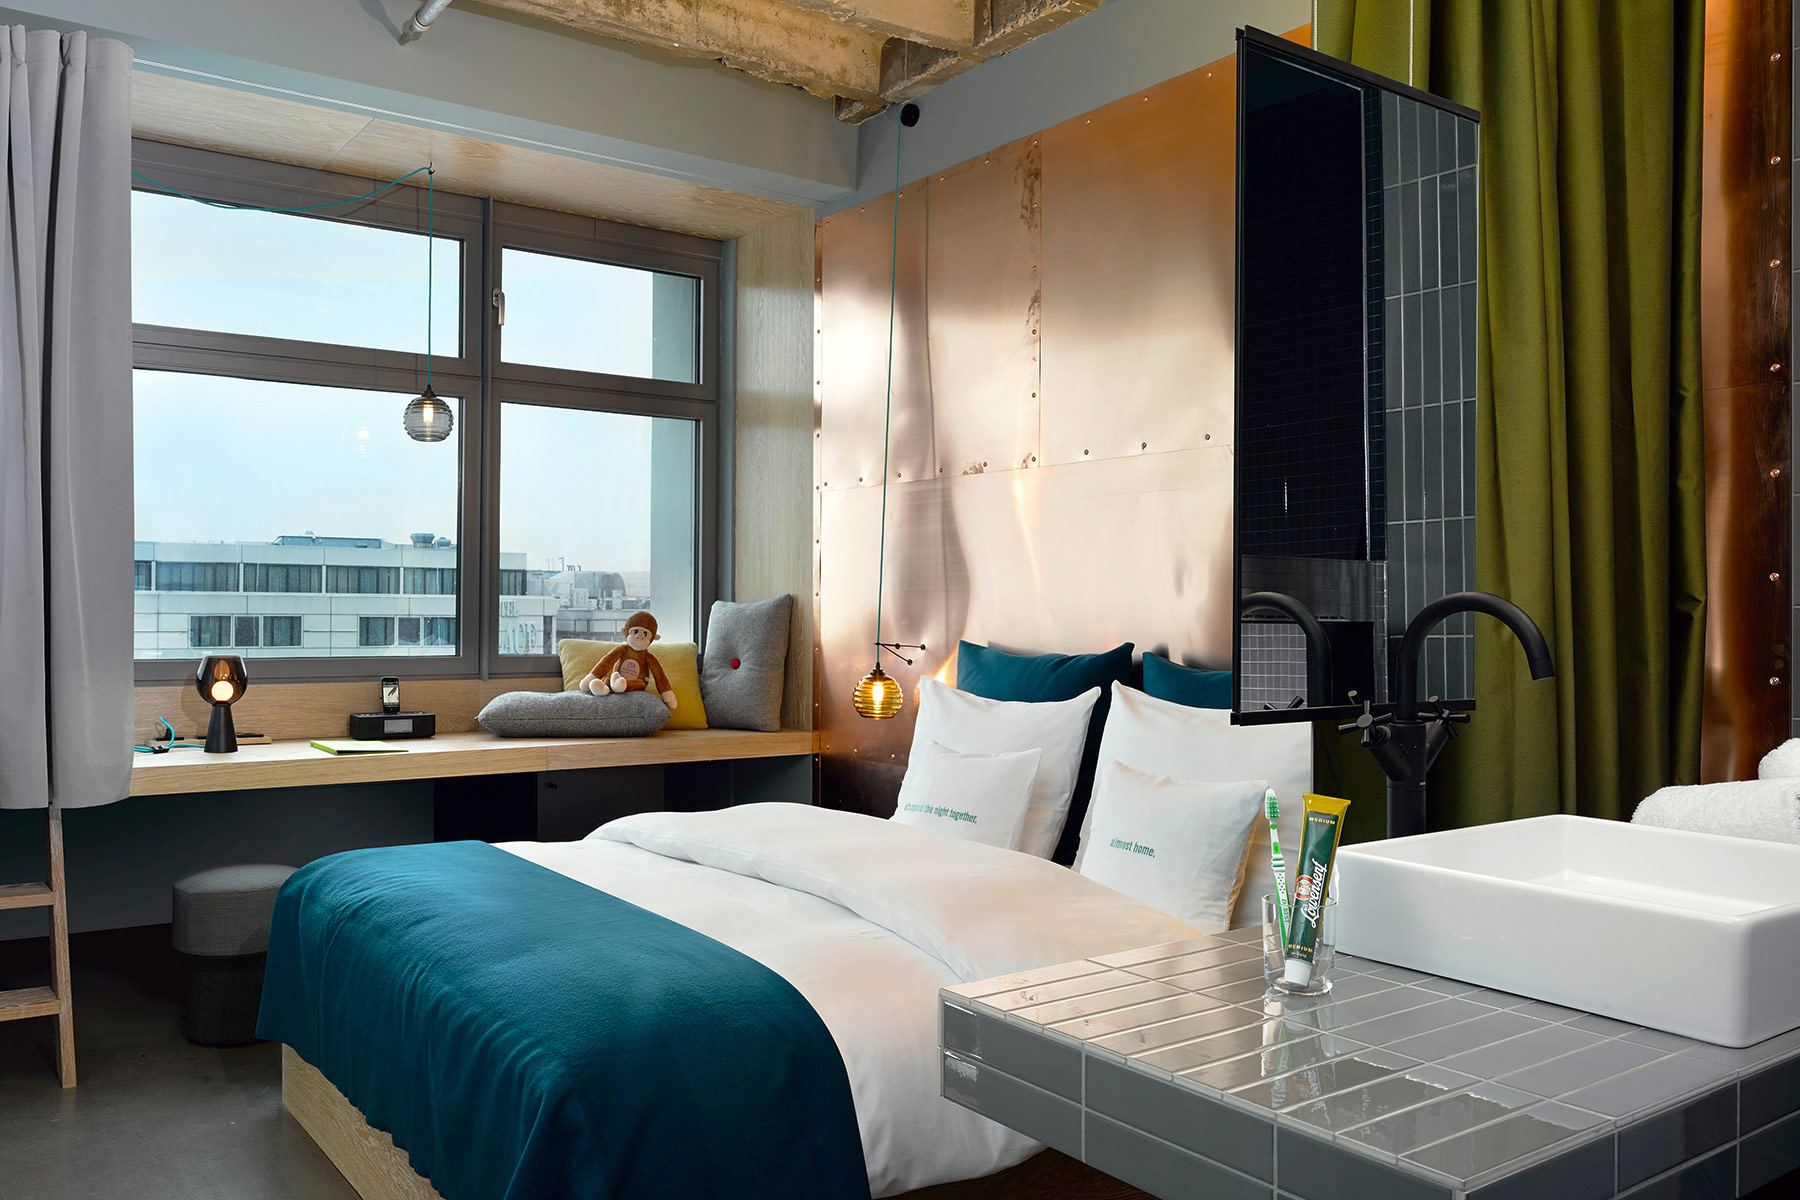 ostoksilla berliiniss shoppailuvinkit tripsteri. Black Bedroom Furniture Sets. Home Design Ideas